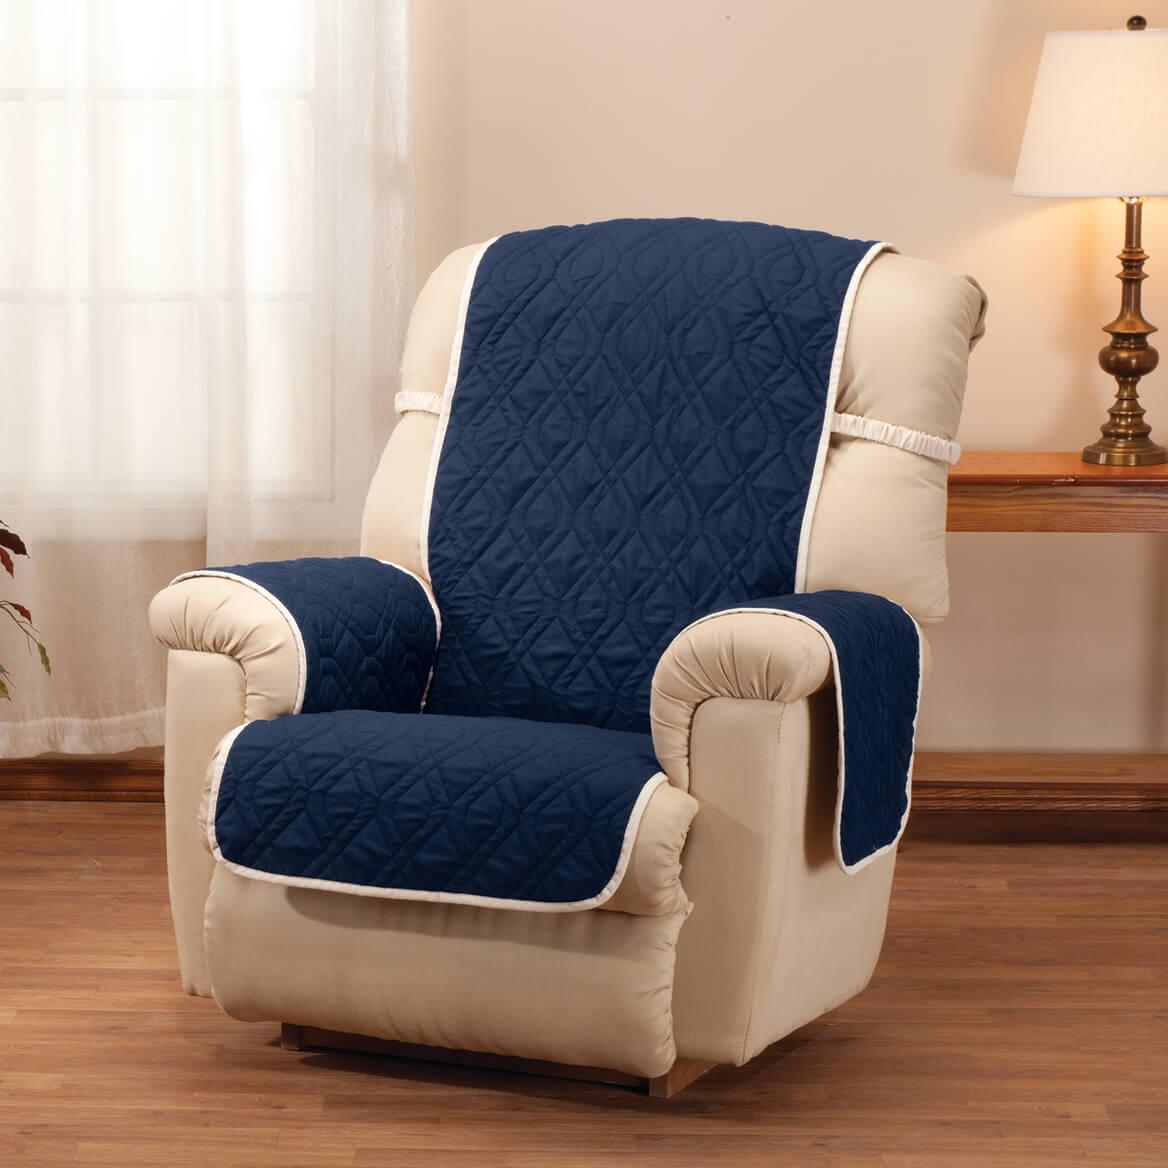 Brilliant Deluxe Reversible Waterproof Recliner Chair Cover Andrewgaddart Wooden Chair Designs For Living Room Andrewgaddartcom